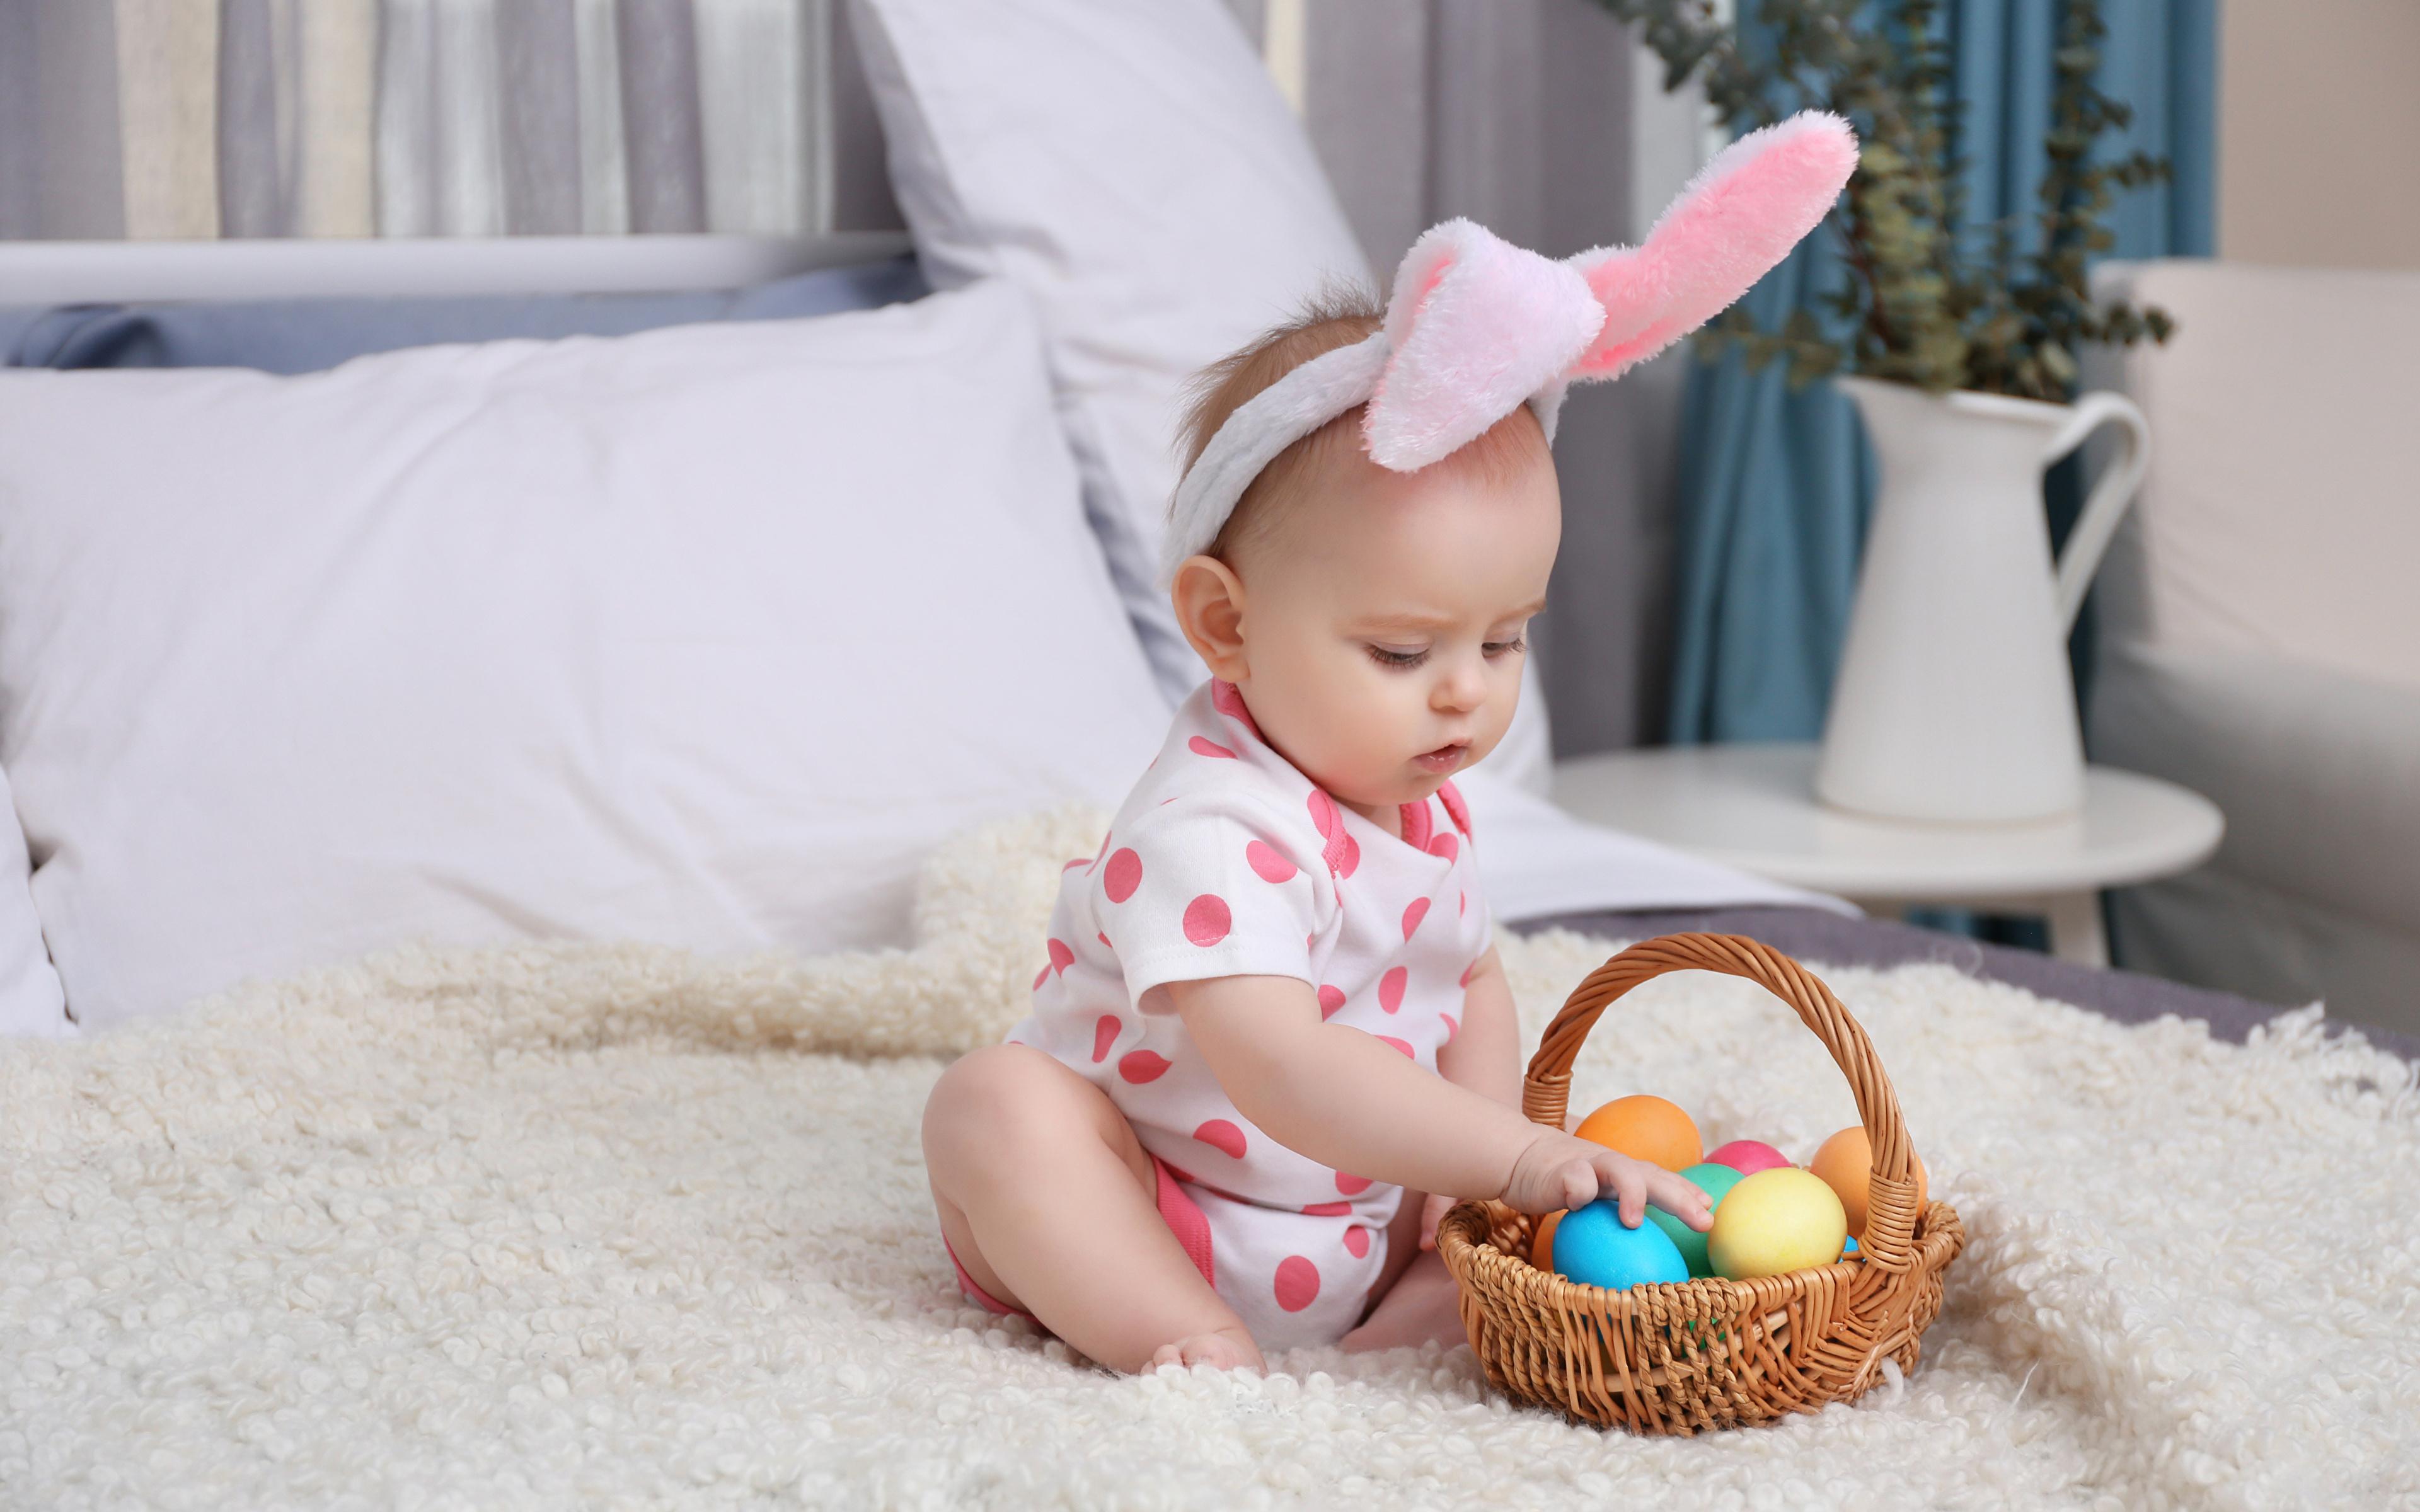 Фото Пасха младенец яйцами ребёнок Корзина 3840x2400 младенца Младенцы грудной ребёнок яиц Дети Яйца яйцо корзины Корзинка